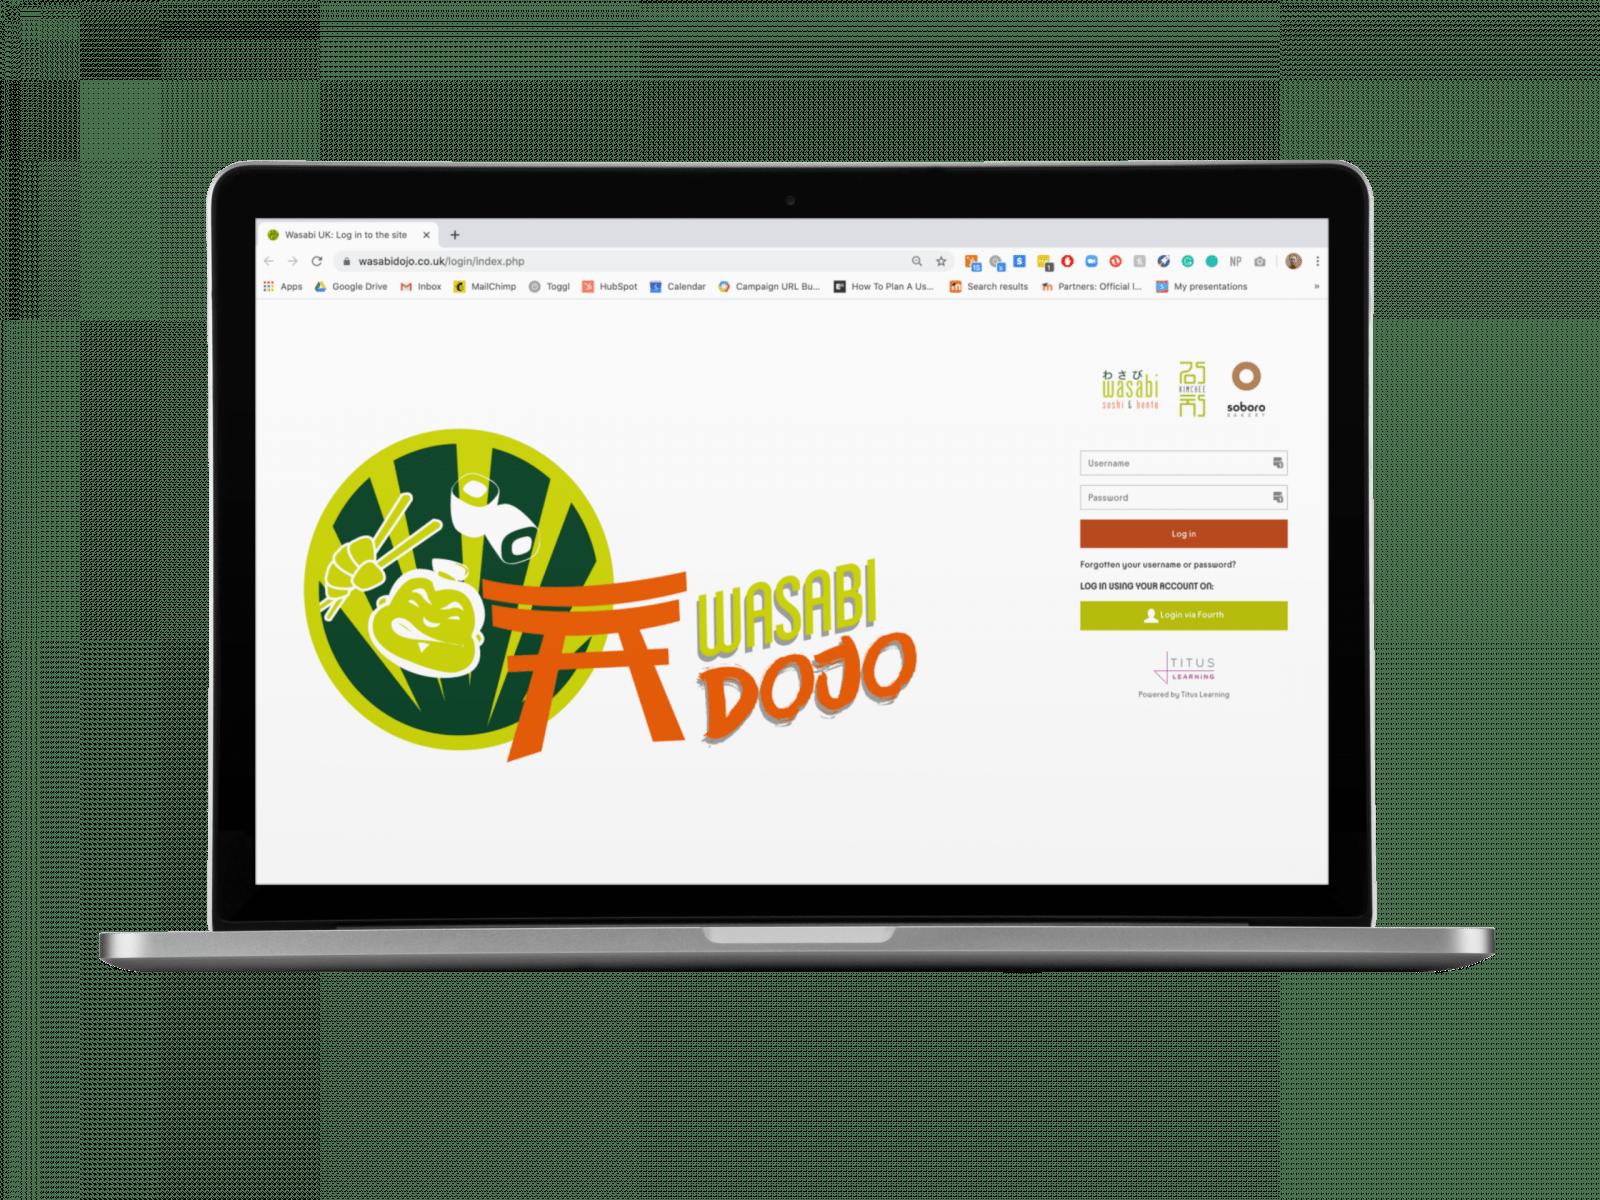 Wasabi - Titus Moodle Client - Mockup